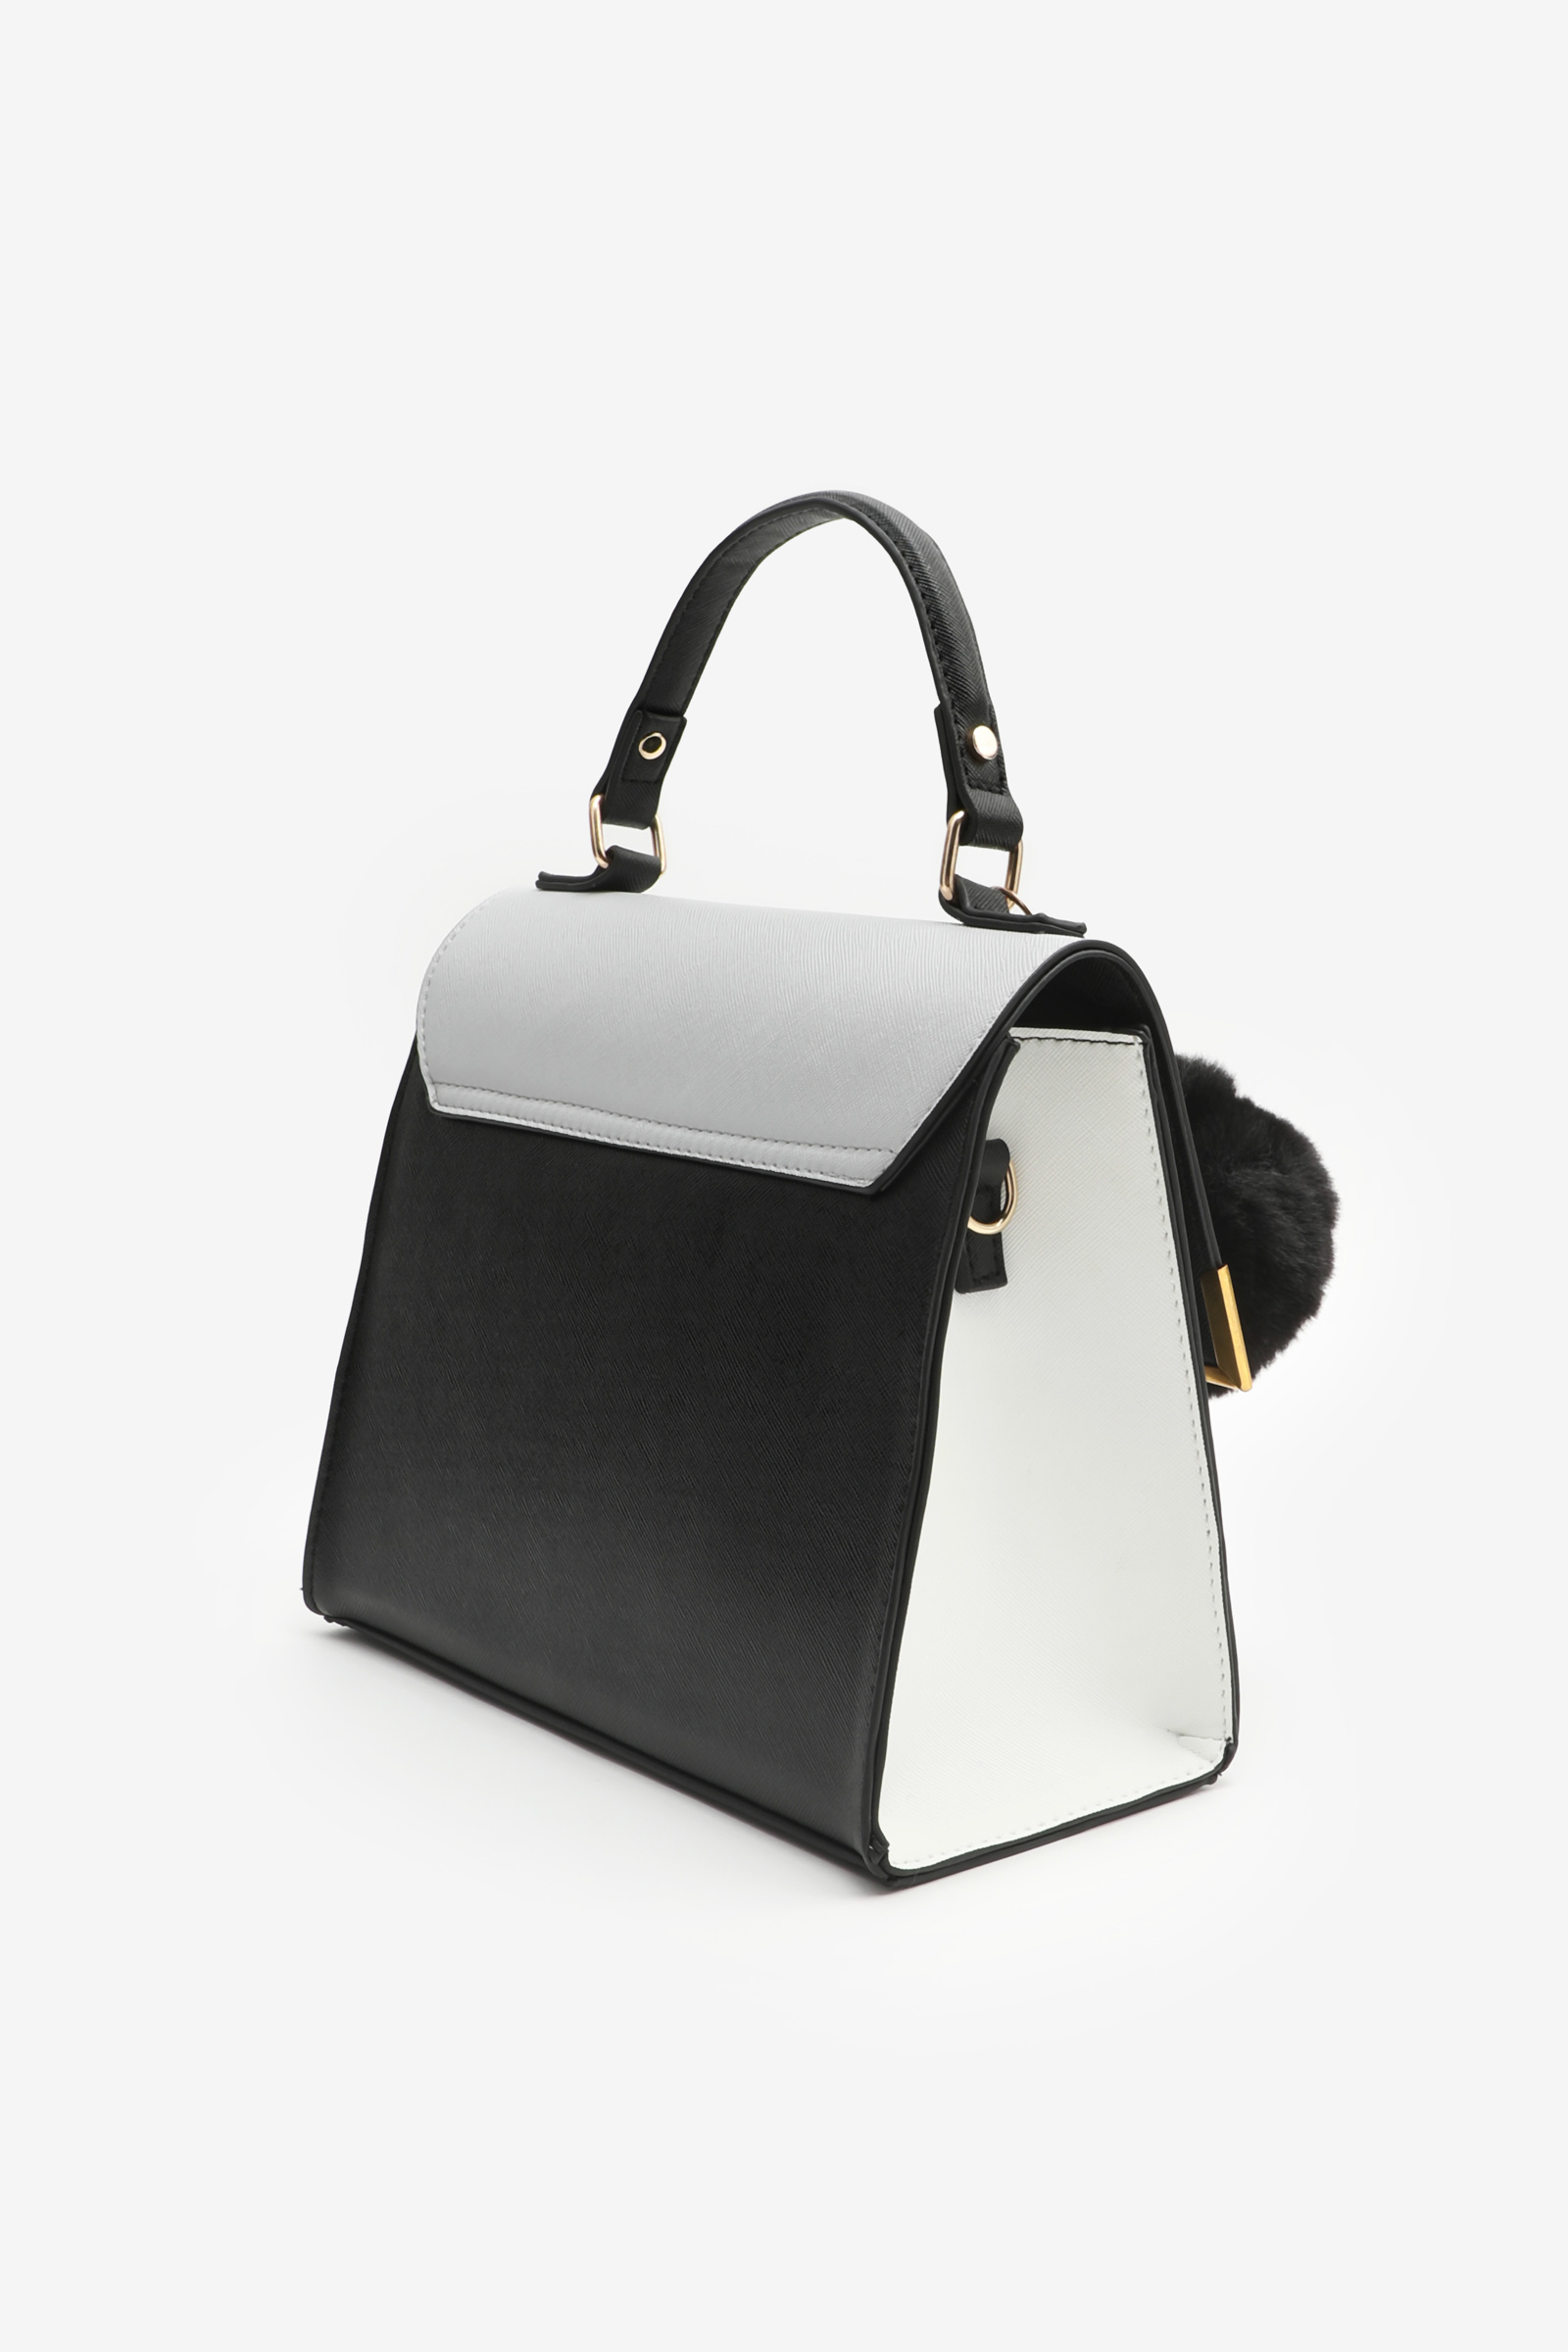 Small Tote Bag with Metal Corners